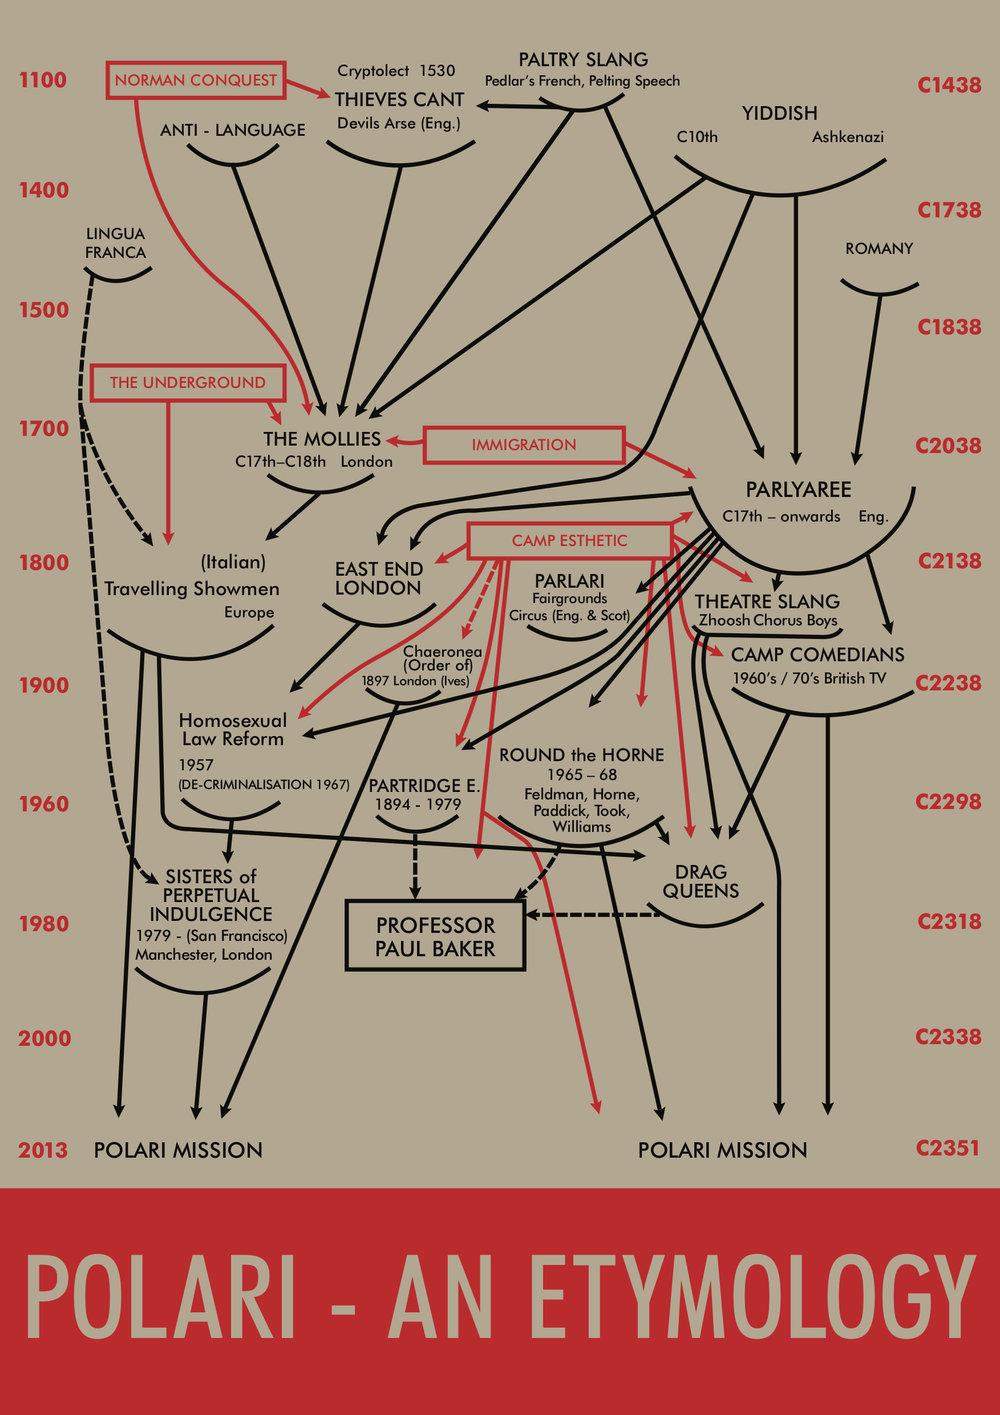 Ploari Barr Diagram